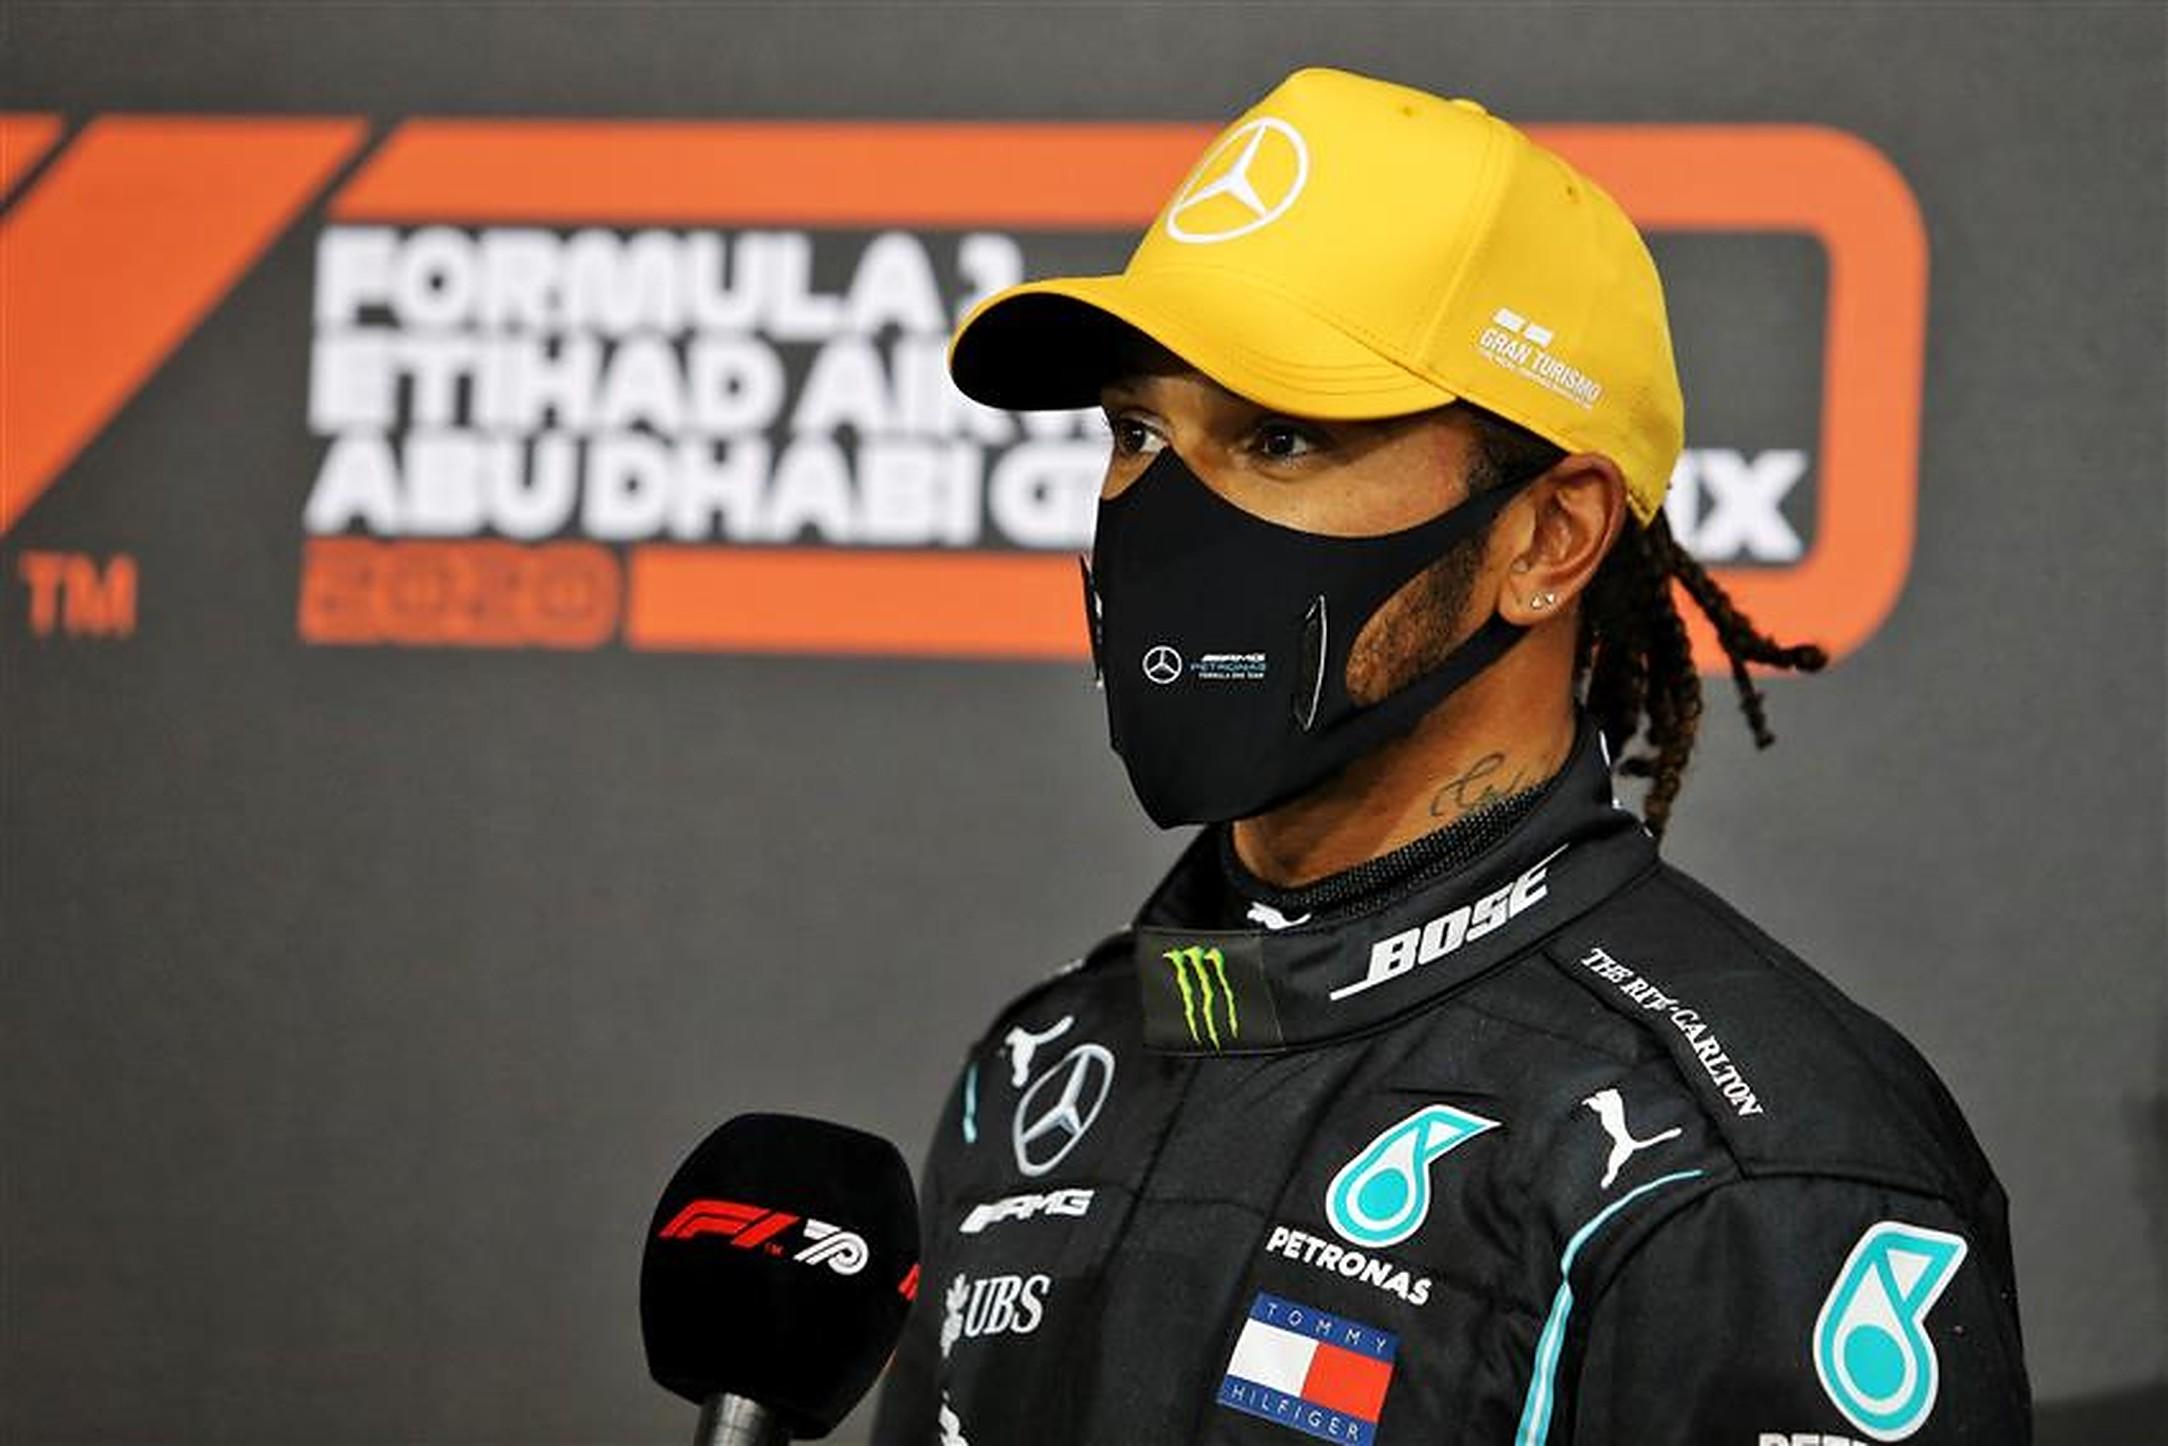 Lewis Hamilton is owed an apology - Formula1news.co.uk